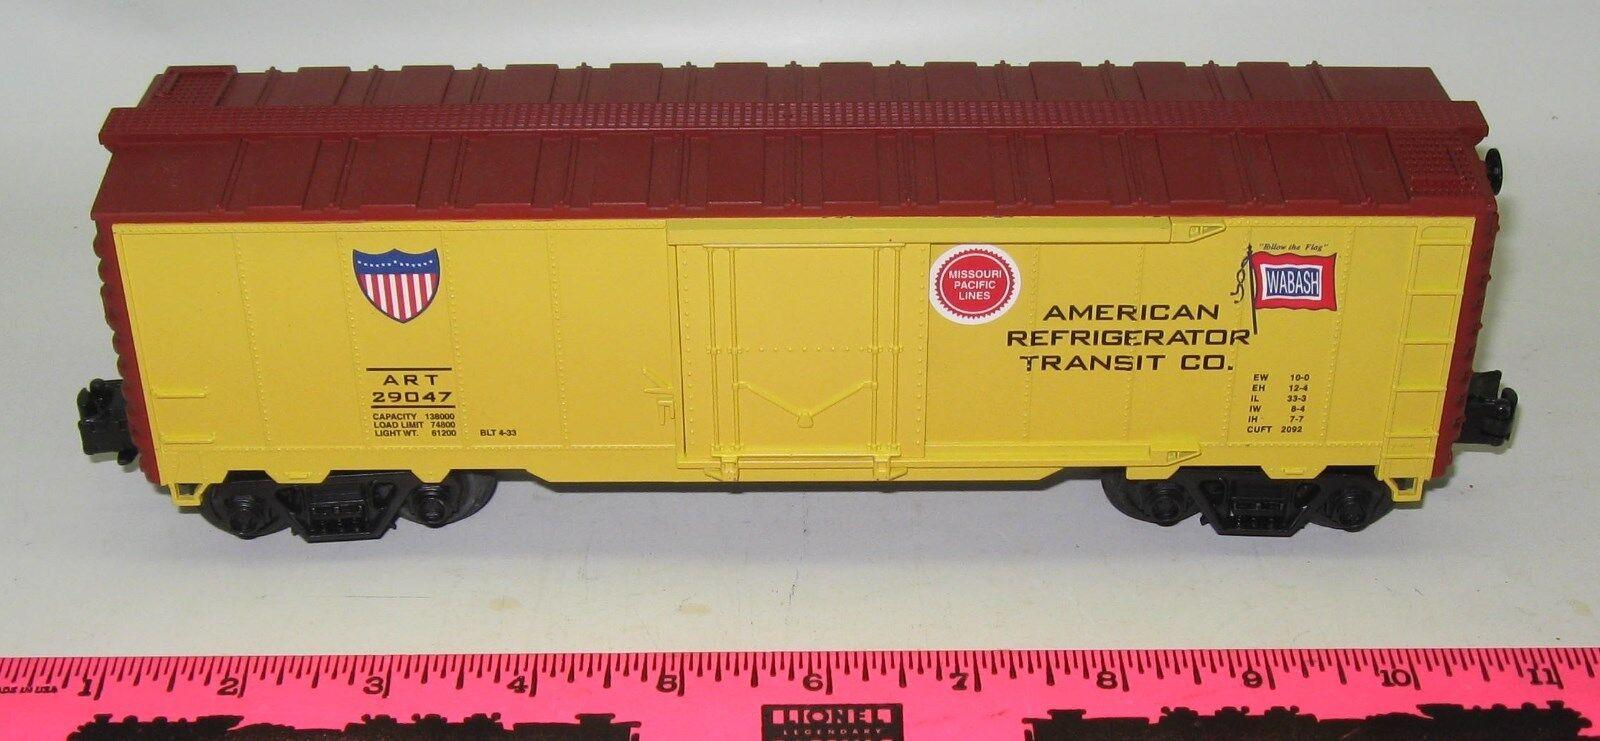 IDM 29047 American Refrigerator transit co boxcar